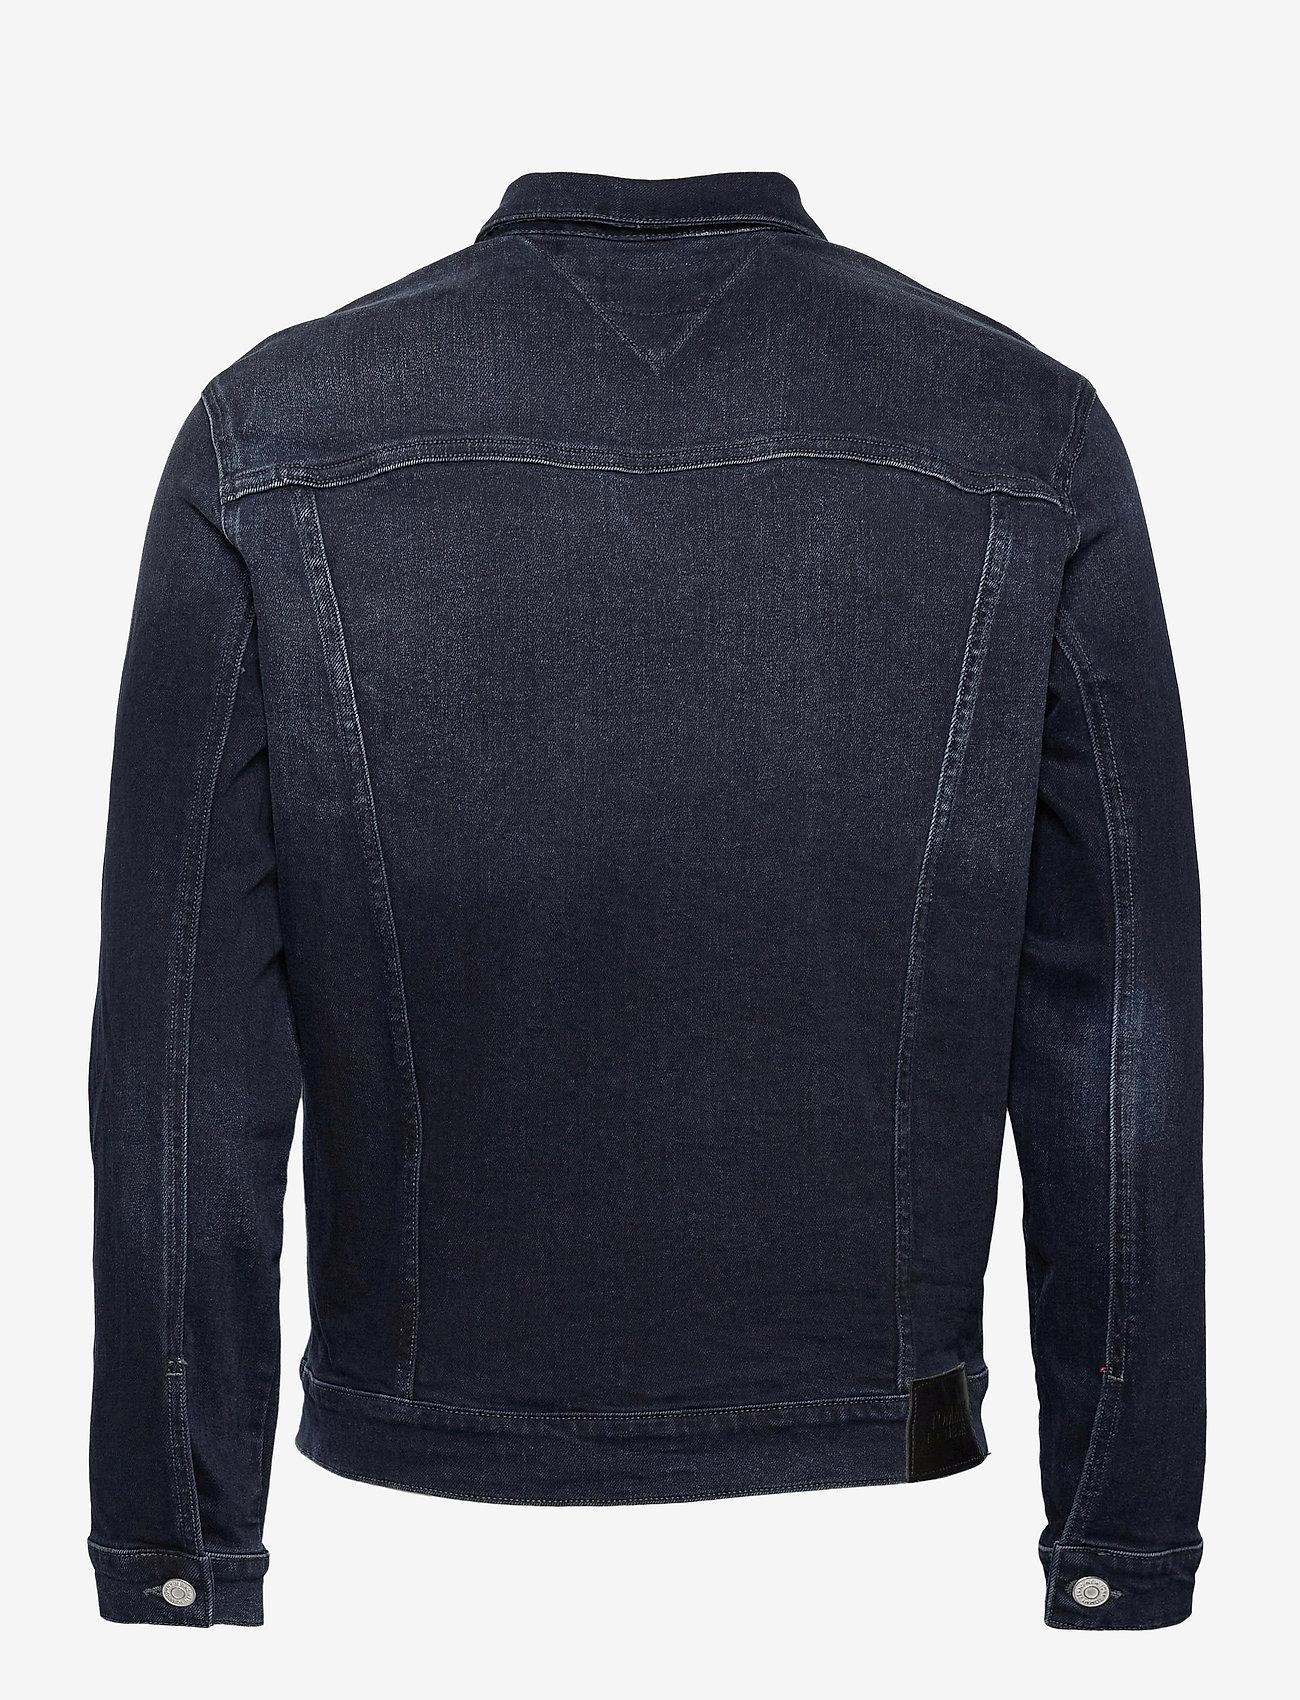 Tommy Jeans - REGULAR TRUCKER JACKET COBBS - jeansjackor - cornell bl bk str - 1